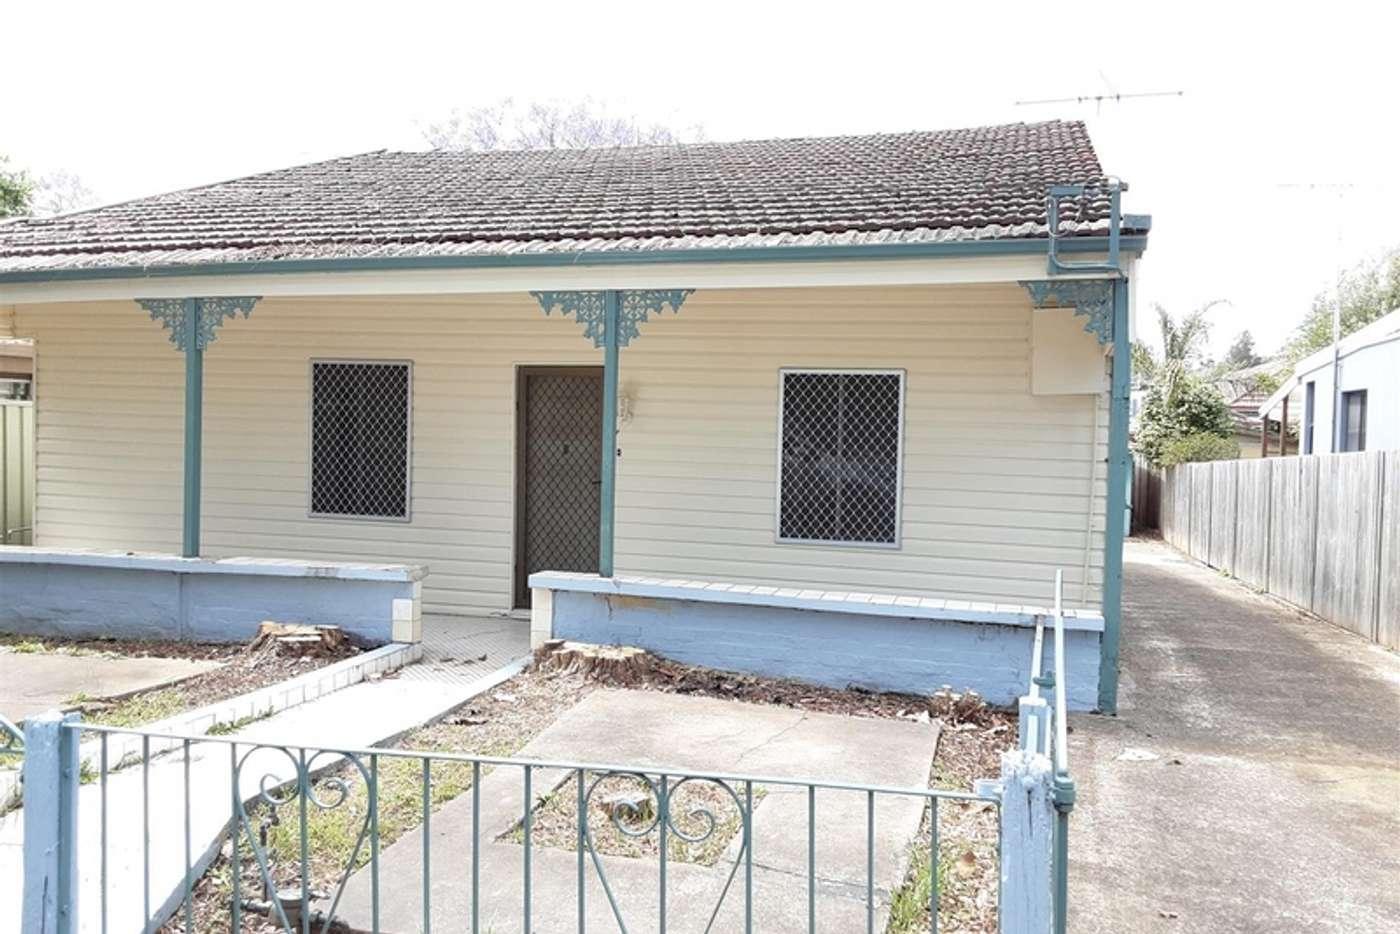 Main view of Homely house listing, 7 Railway Street, Croydon NSW 2132